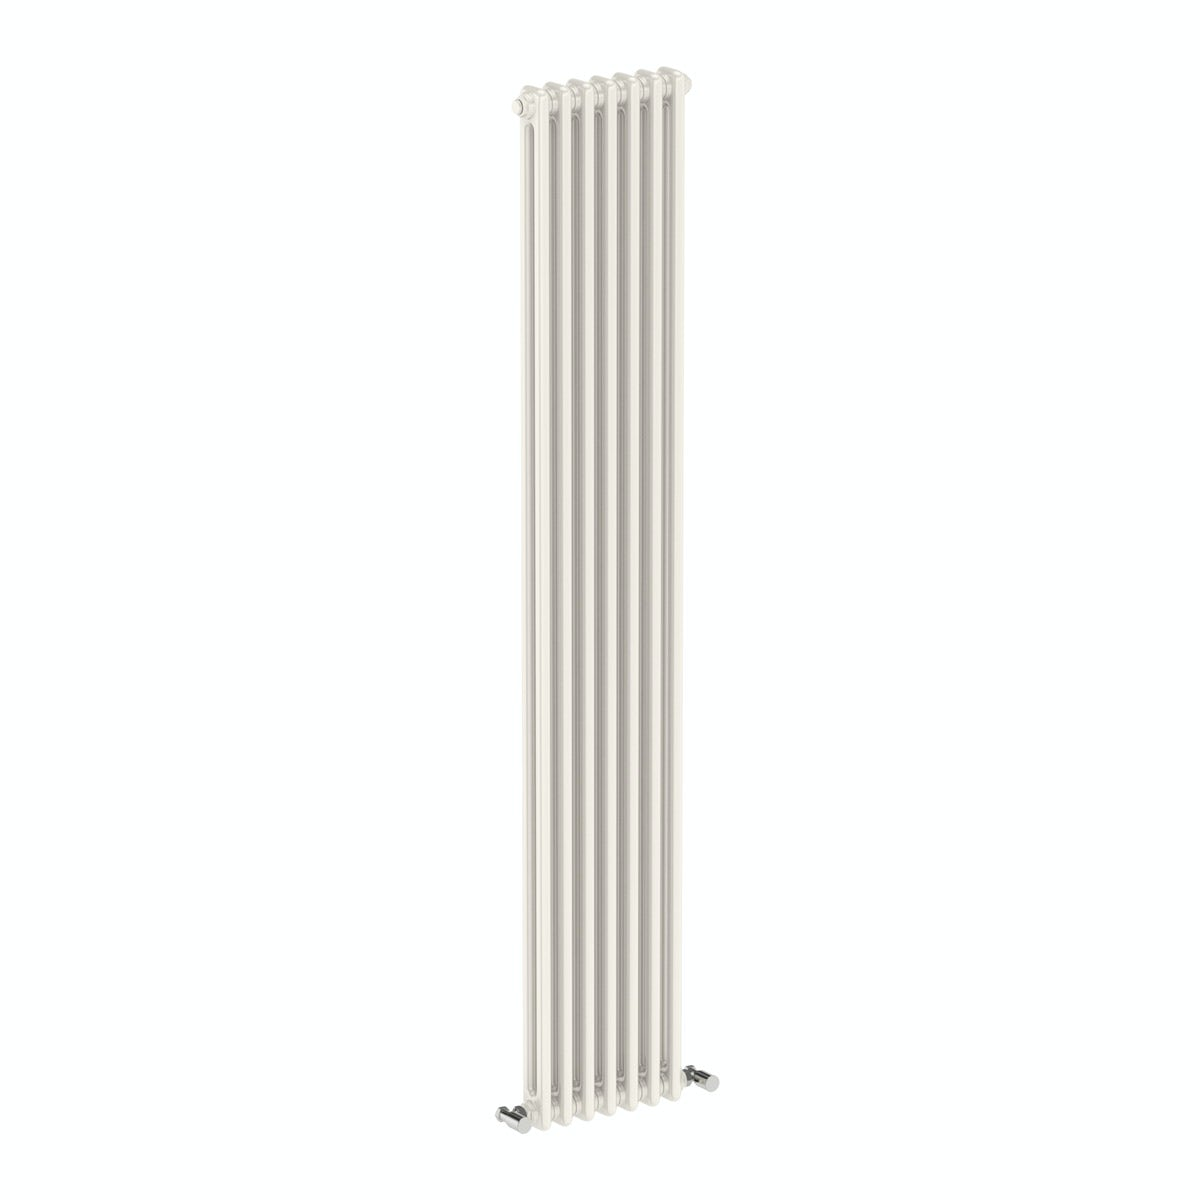 The Bath Co. Dulwich vertical white double column radiator 1800 x 335